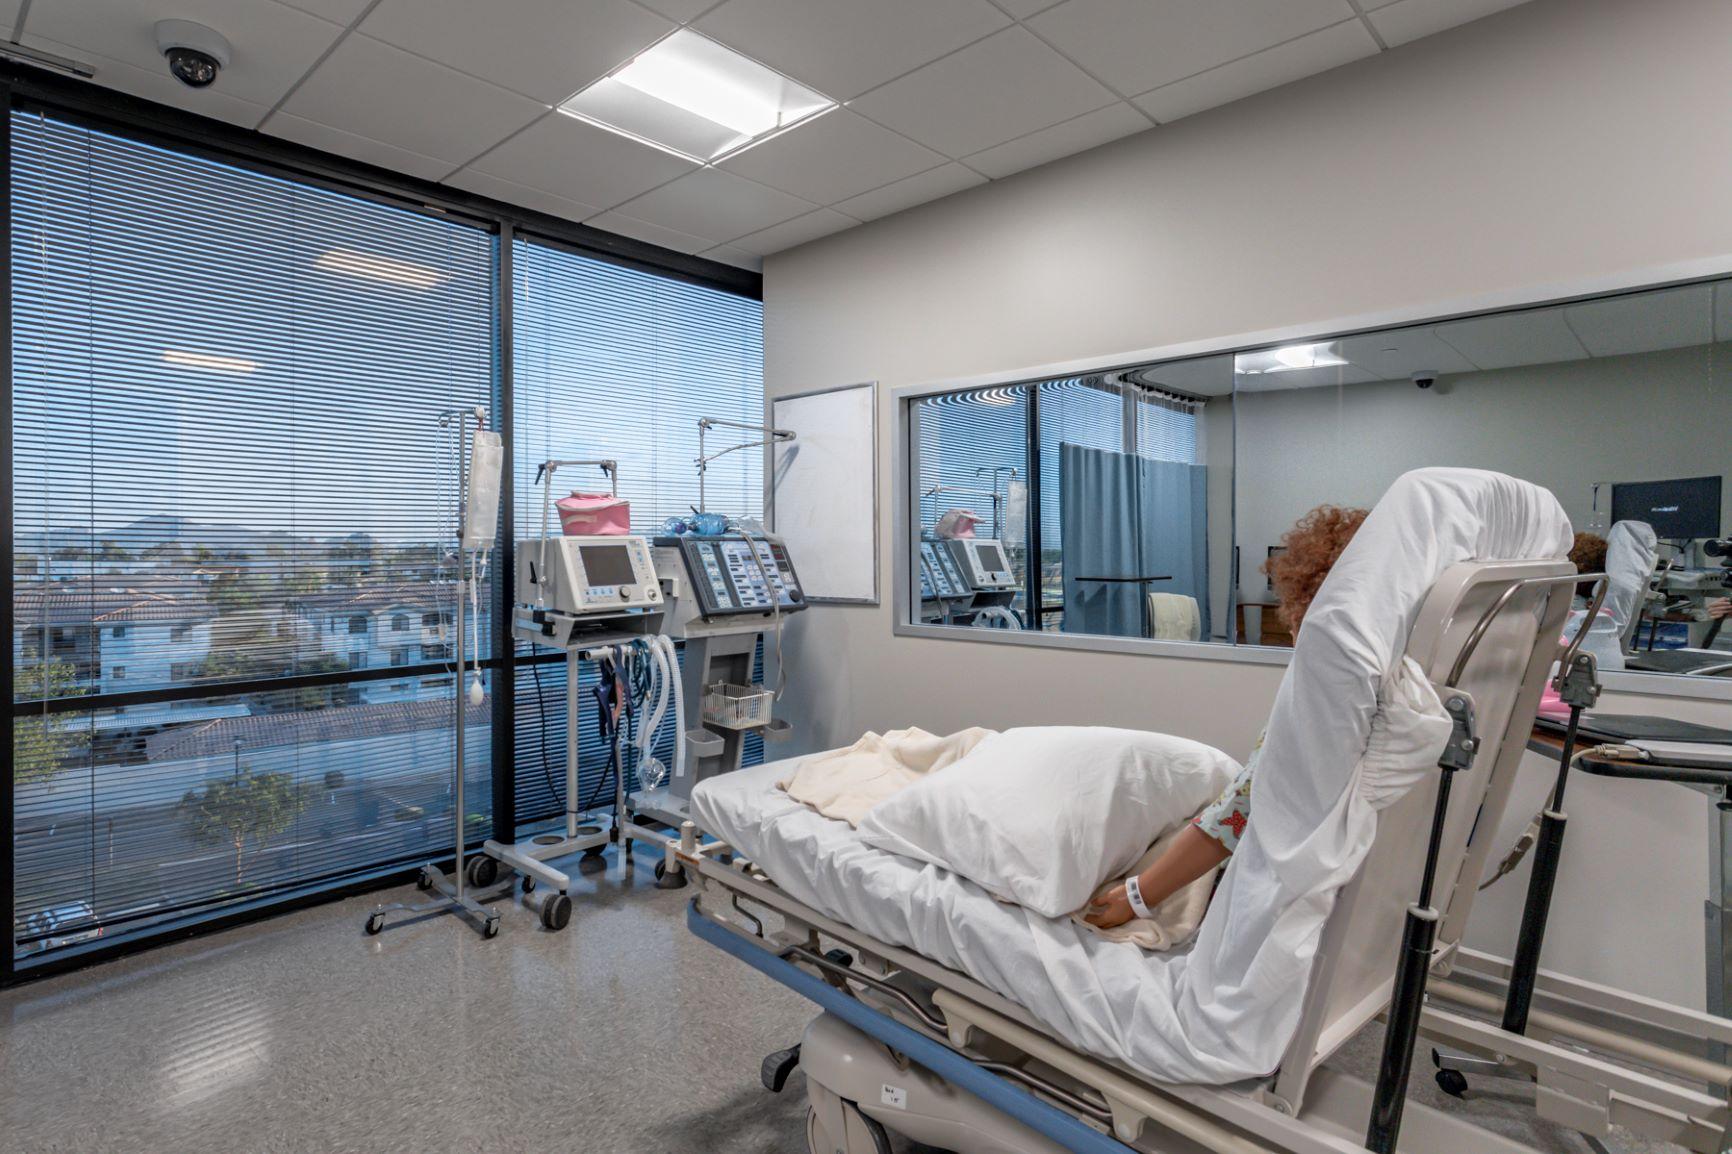 Arizona College of Nursing - Las Vegas